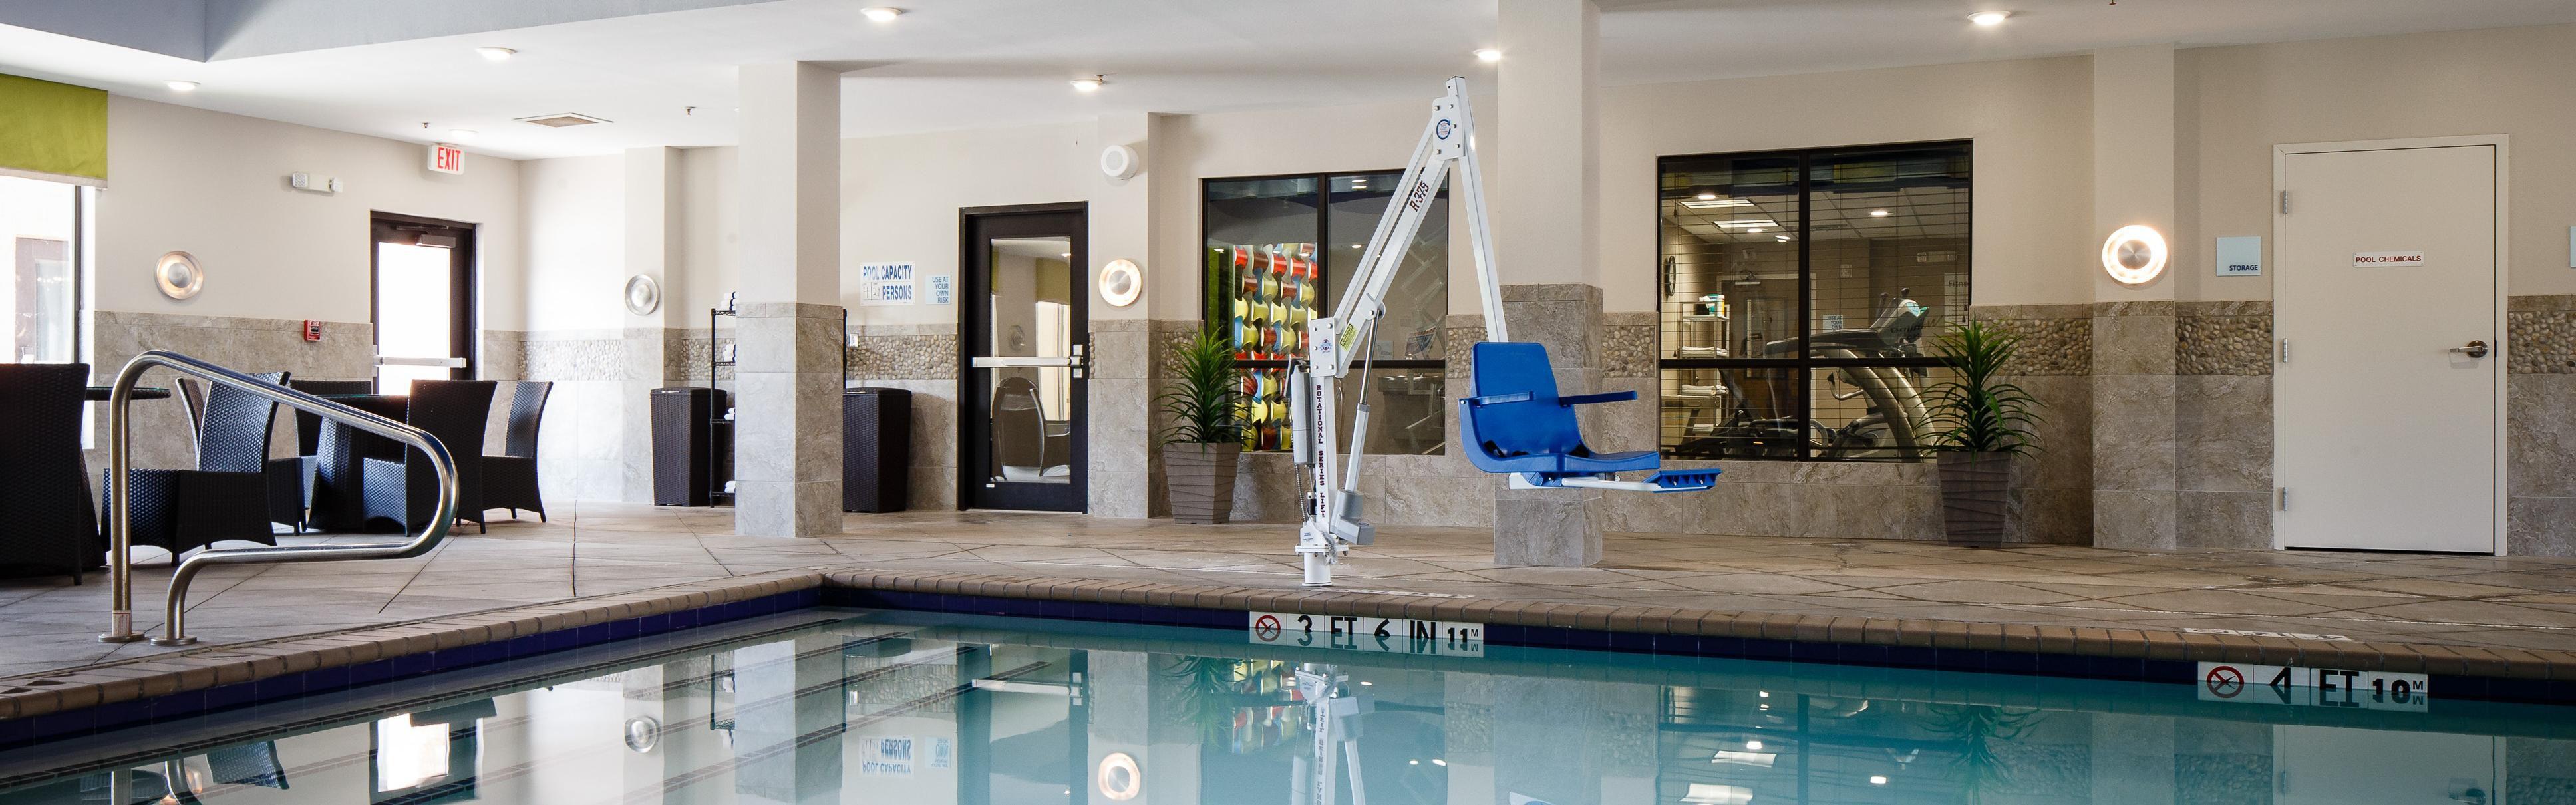 Rent Reno Apartments with Siegel Suites  No Credit Ok